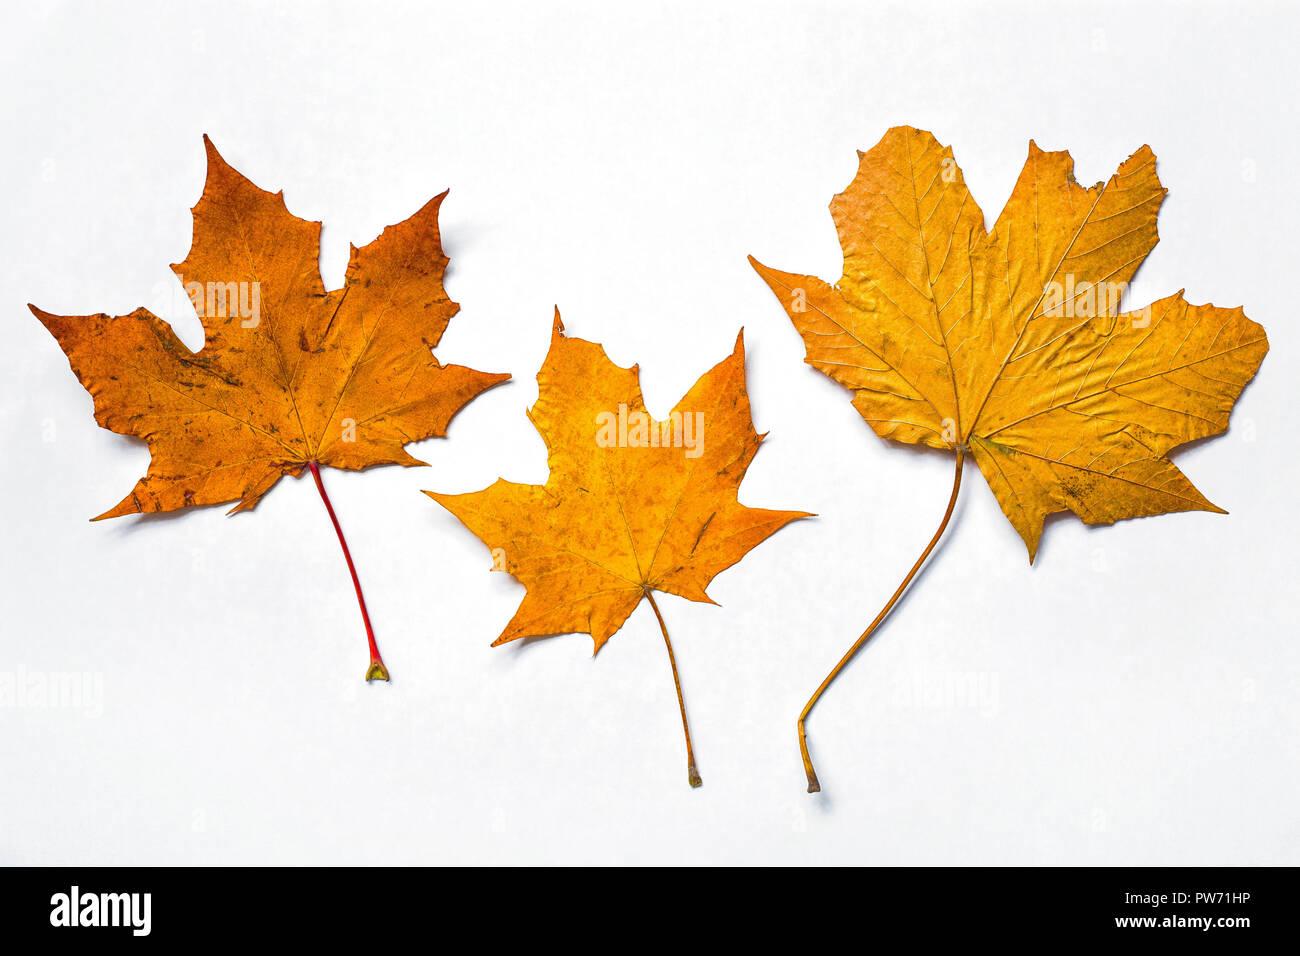 Autumn Leaves on white background Stock Photo